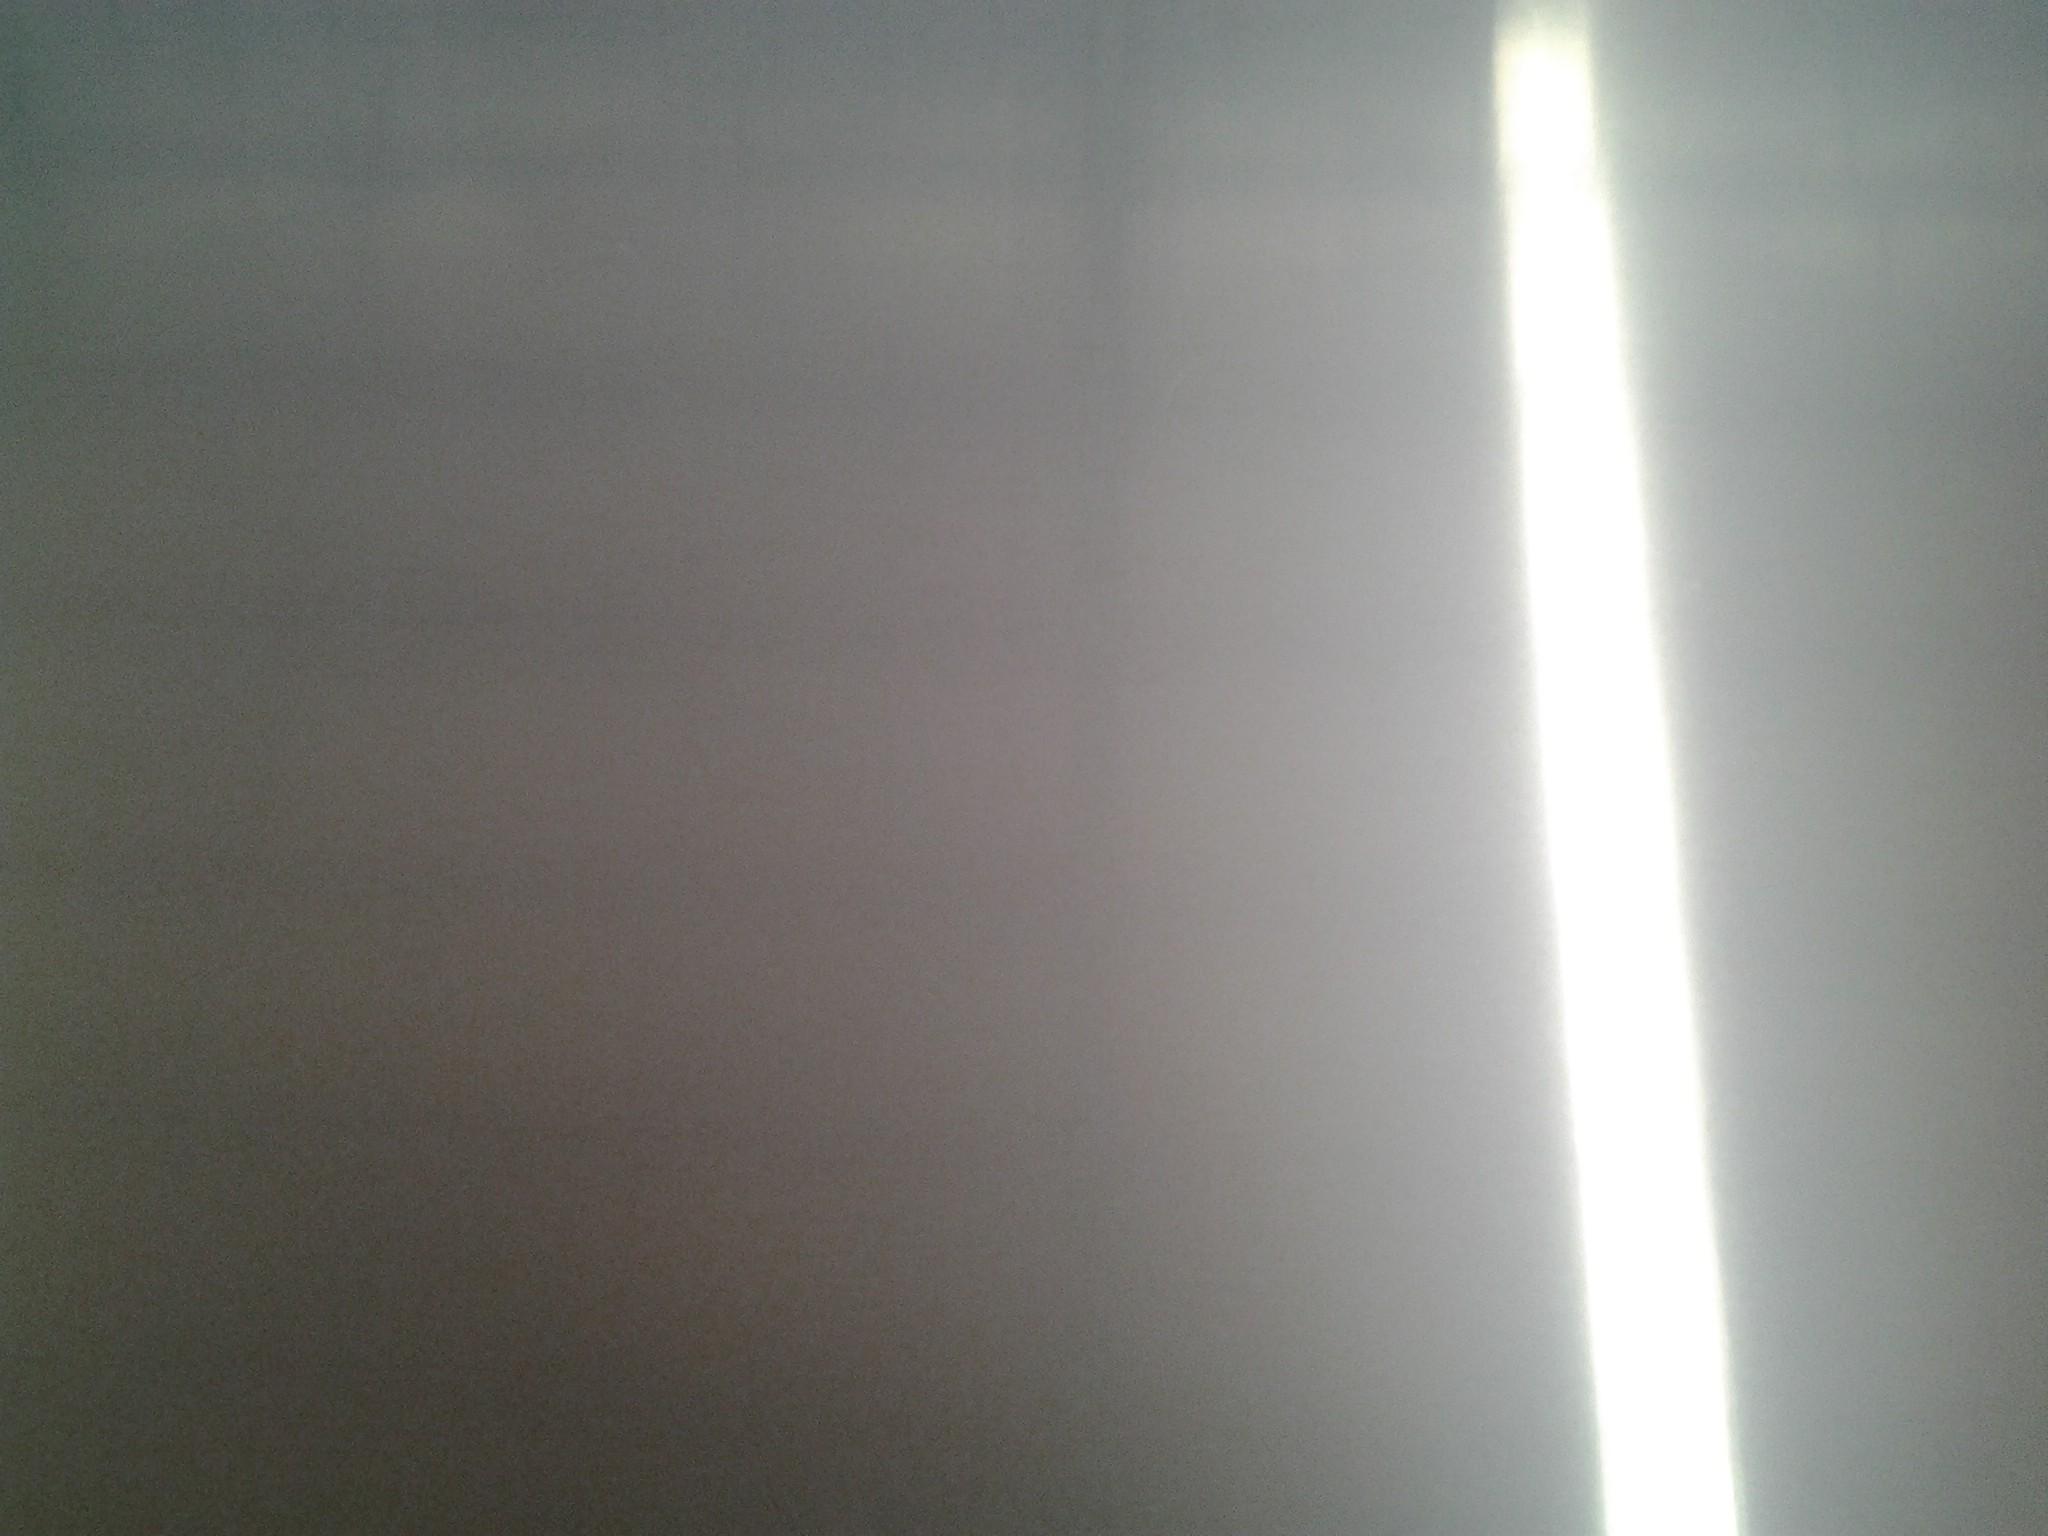 430 Stainless Steel Sheet BA finish Mill:TISCO